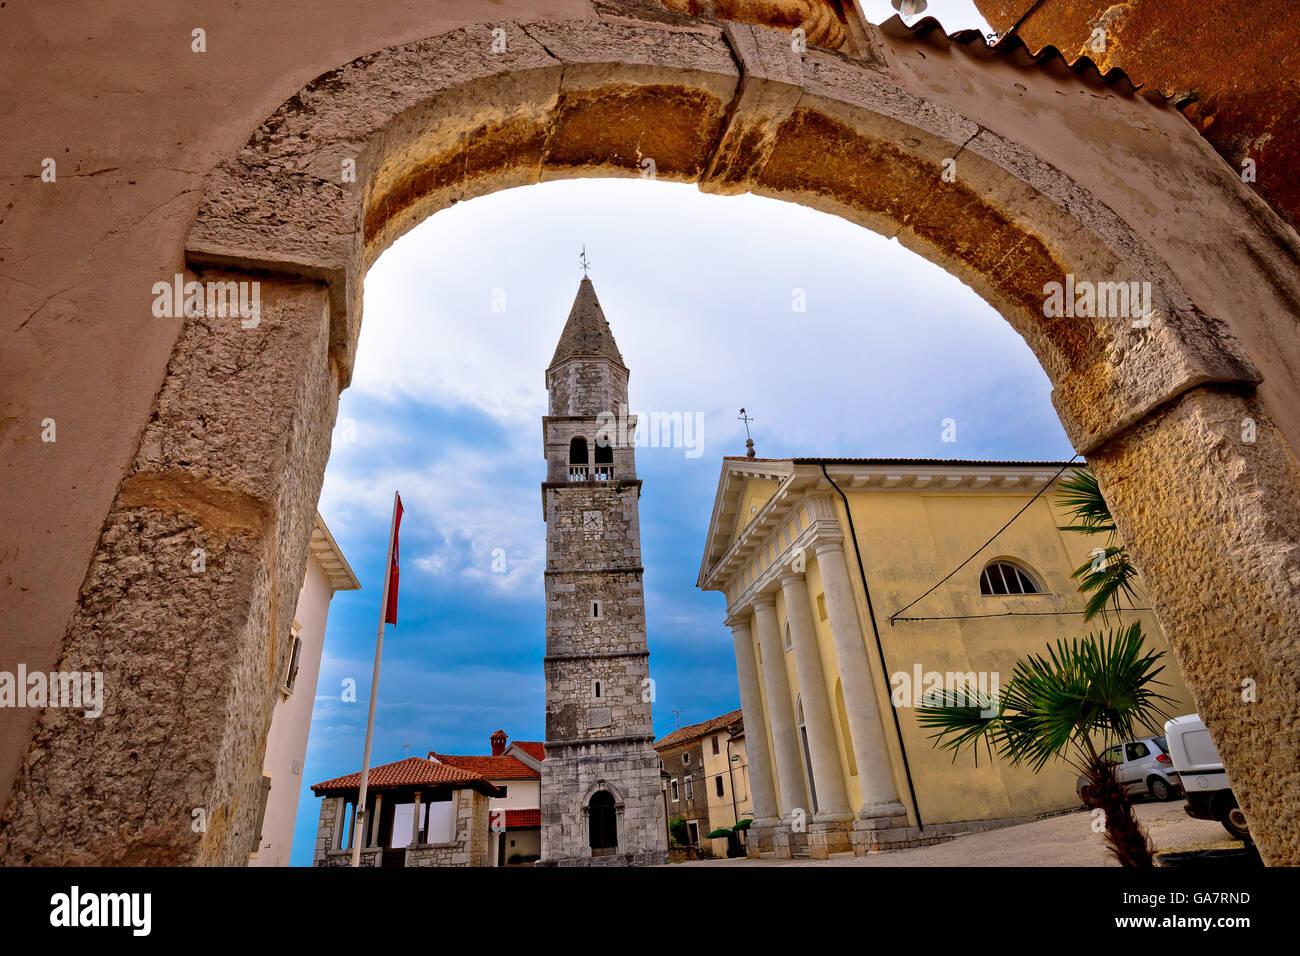 Town of Visnjan square and church, Istria, Croatia - Stock Image